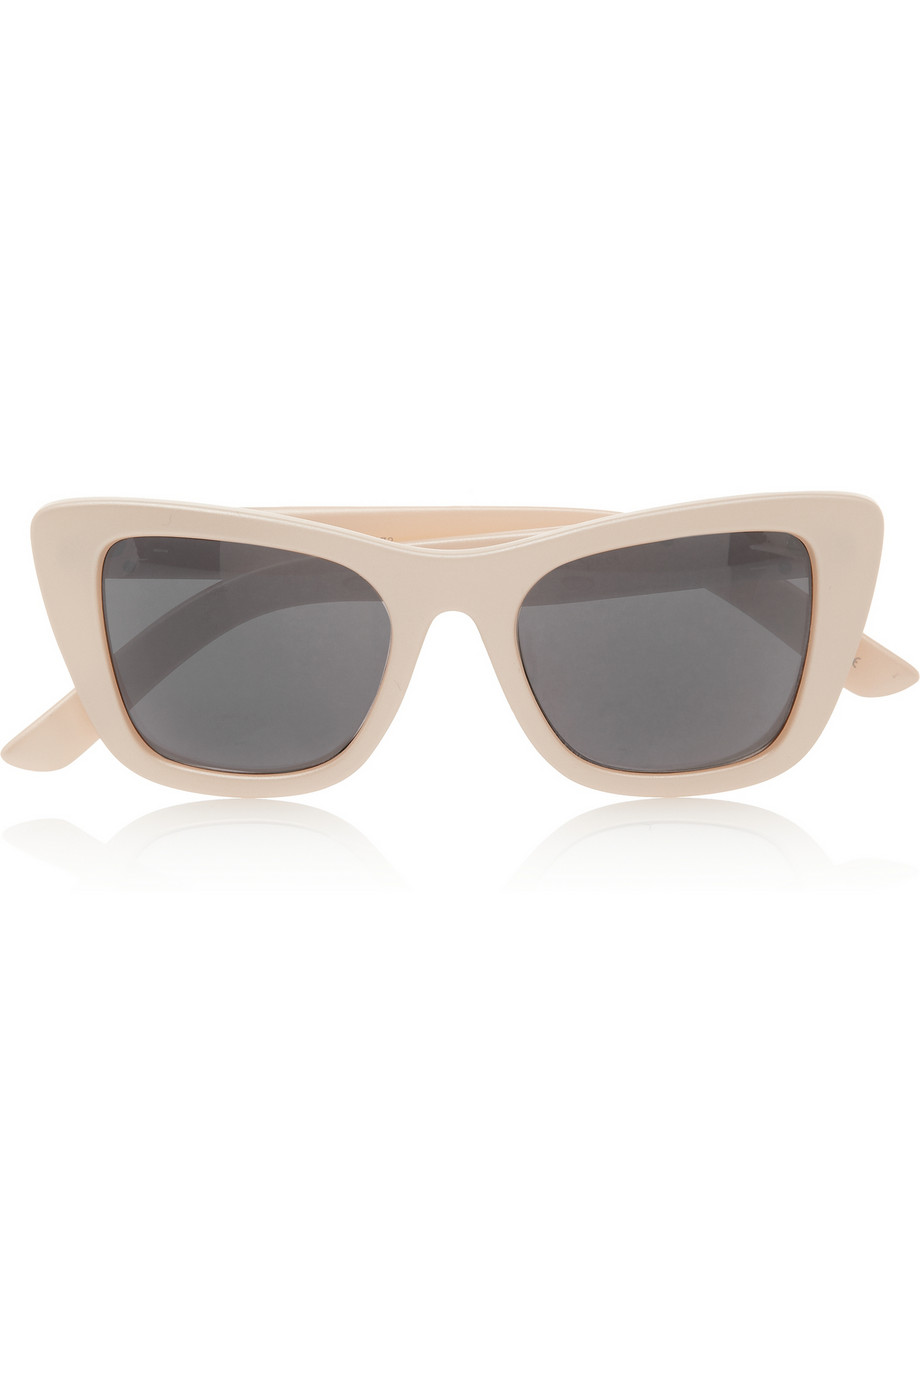 Le Specs Air Heart Cat Eye Sunglasses